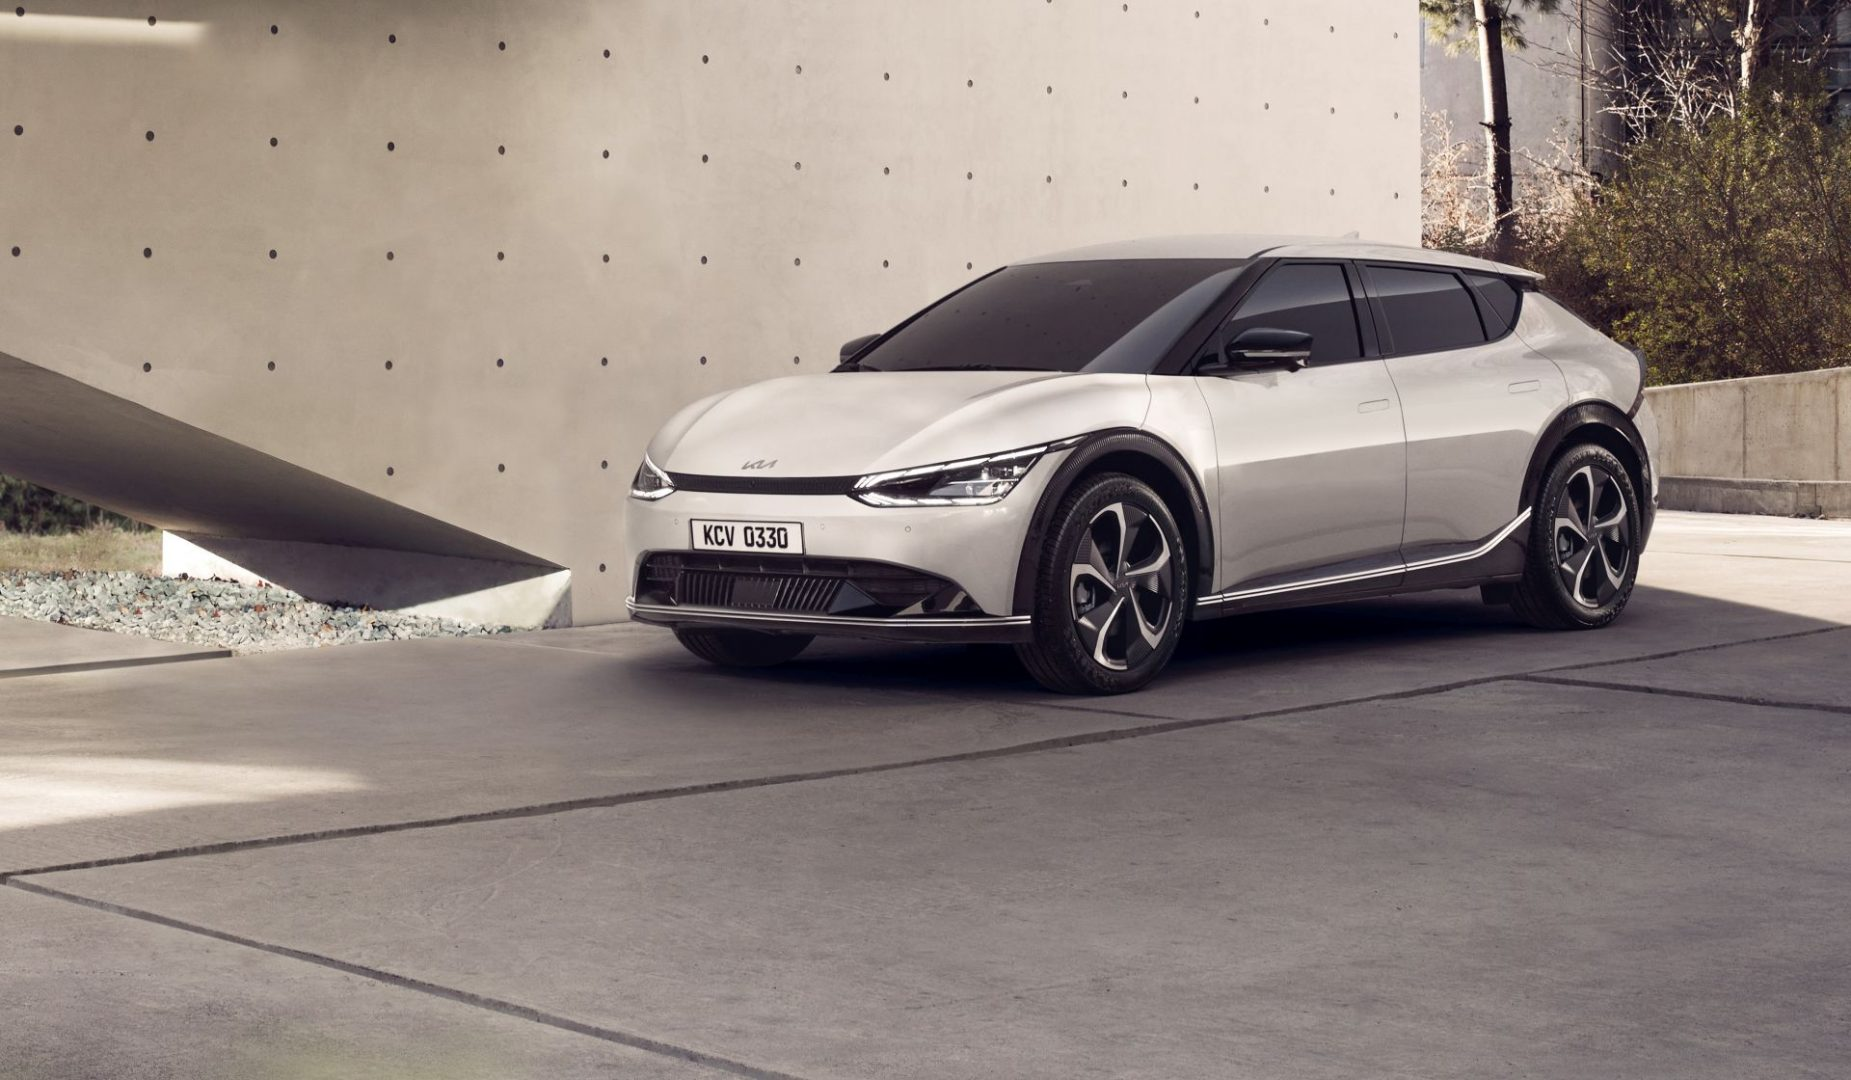 Objavljene prve fotografije i informacije o novom električnom crossoveru Kia EV6